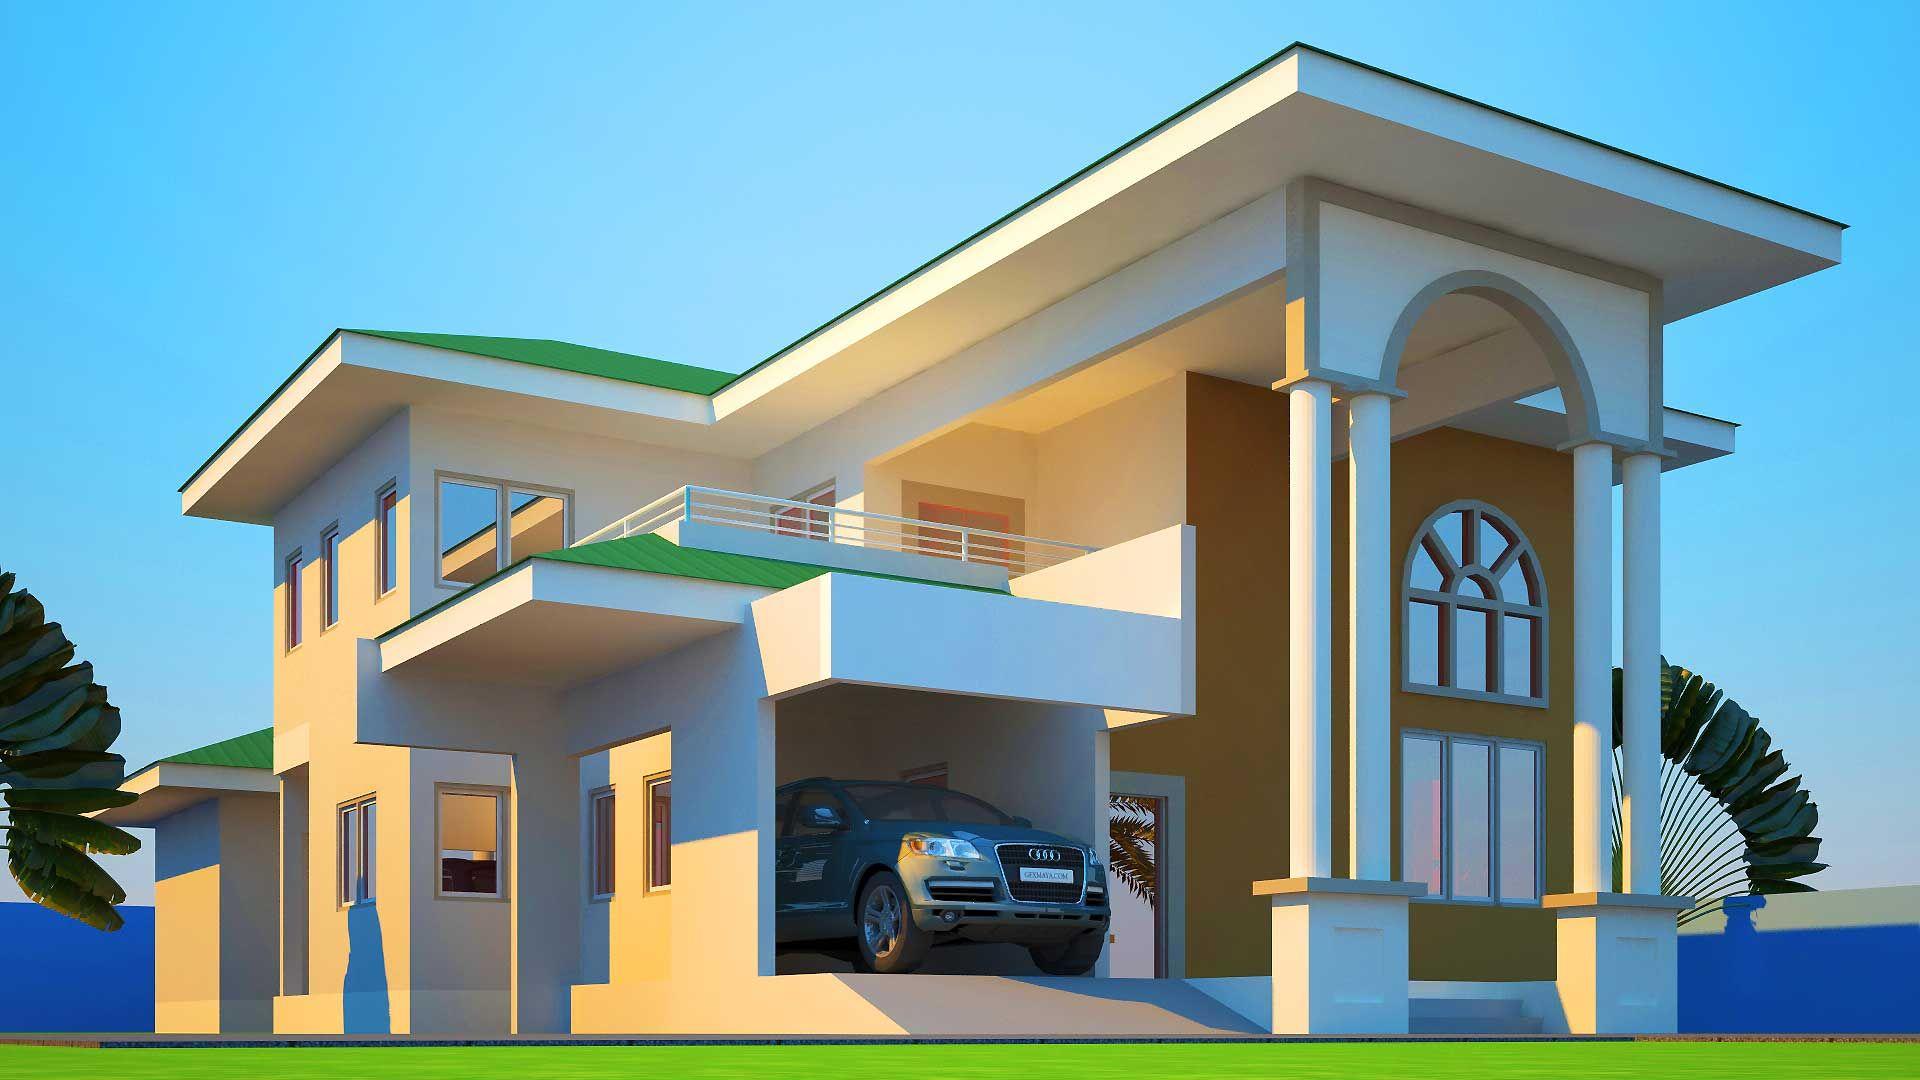 House Plans Ghana Mabiba Bedroom Plan Design Home sq ft